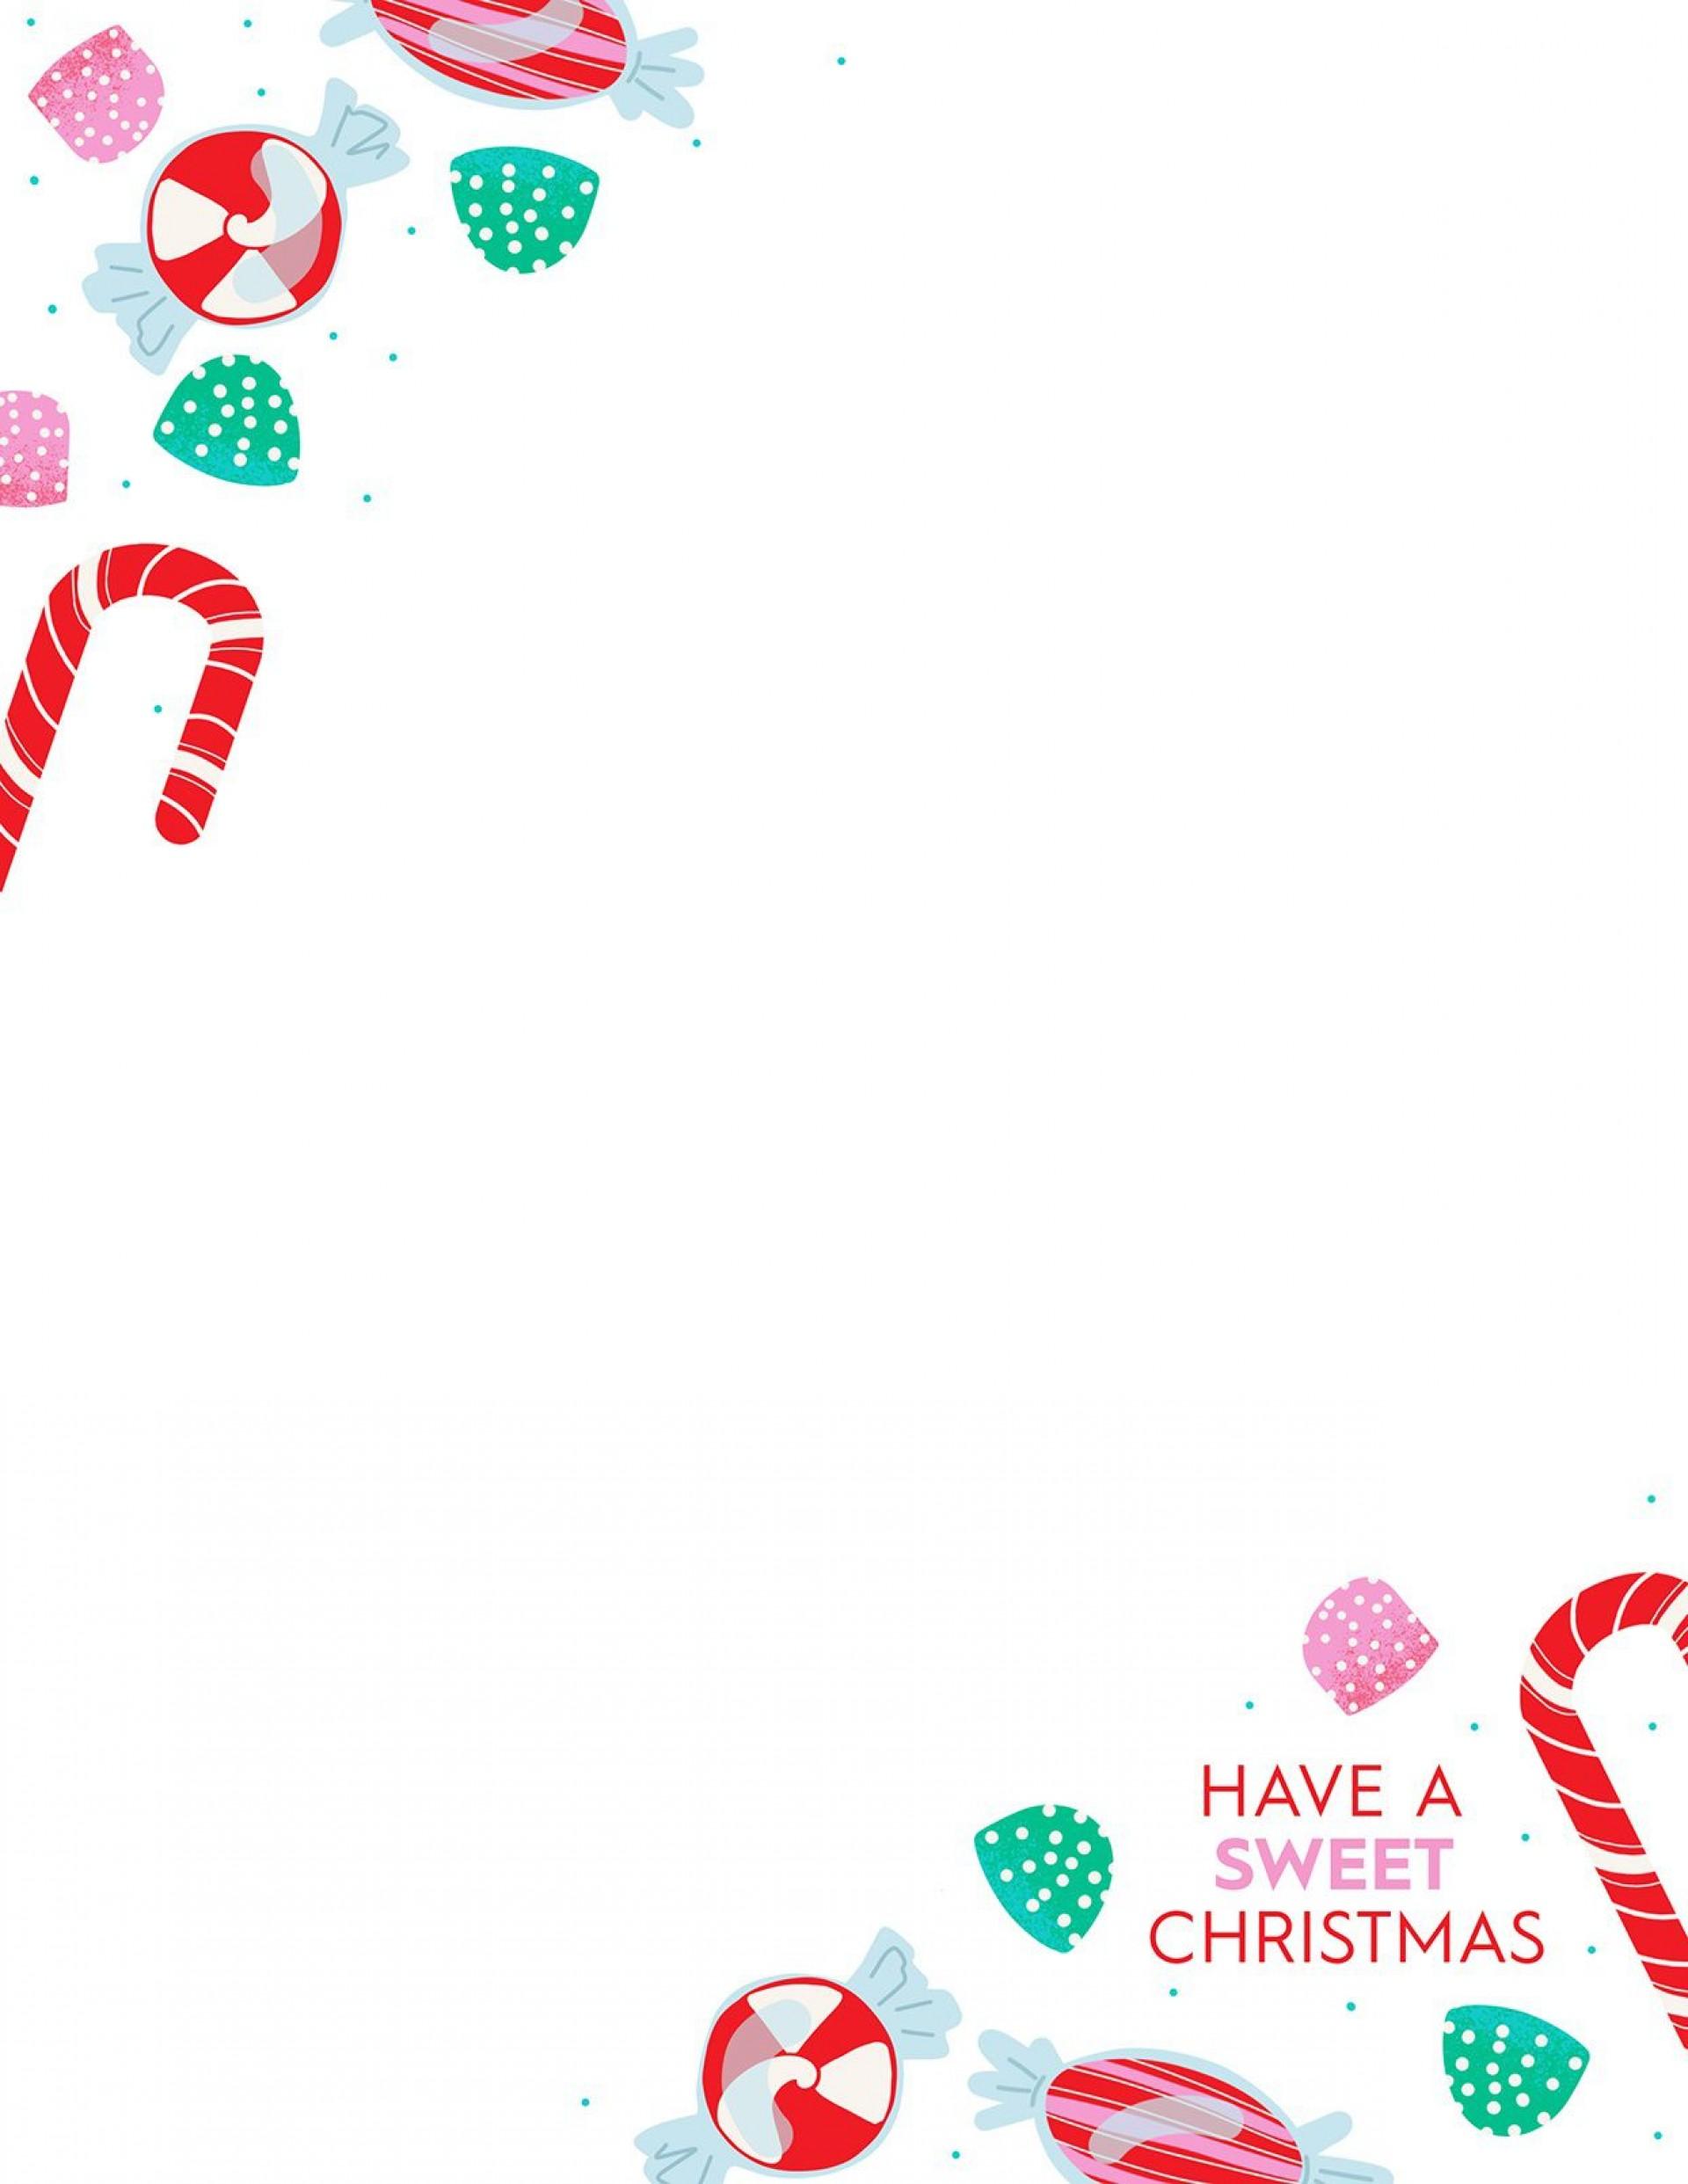 012 Sensational Free Christma Letter Template For Microsoft Word Sample  Downloadable Newsletter1920